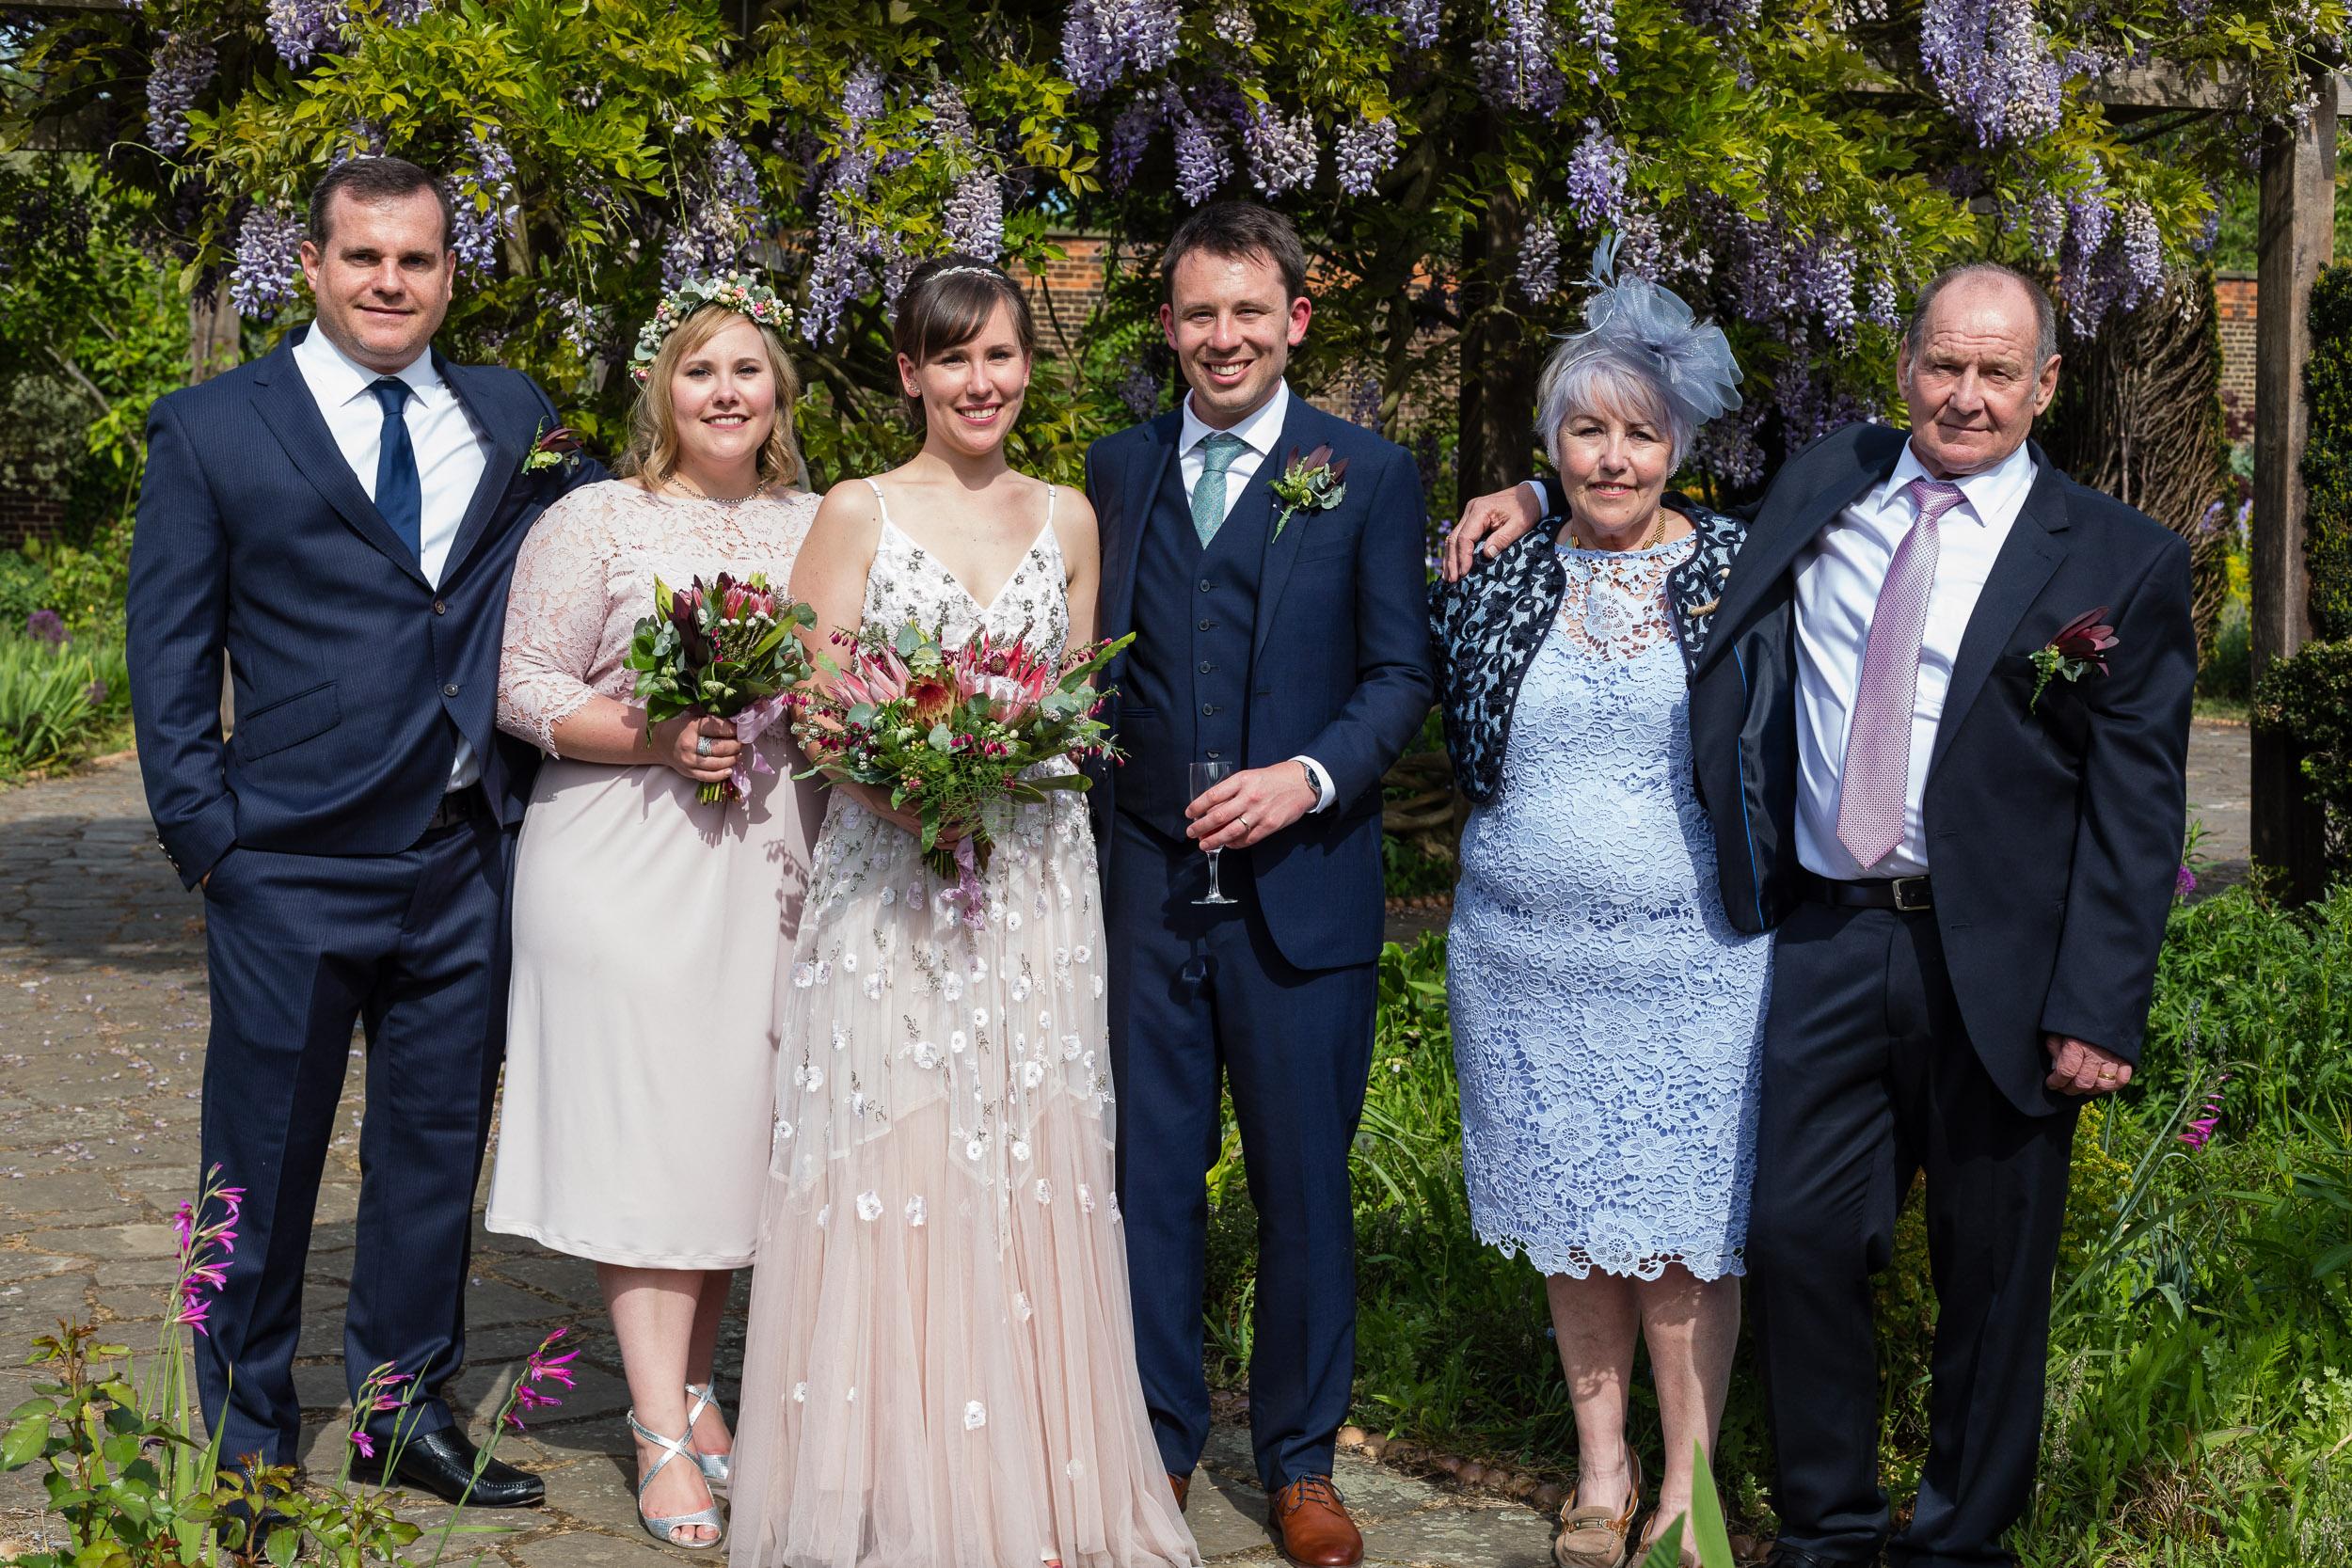 brockwell-lido-brixton-herne-hill-wedding-261.jpg